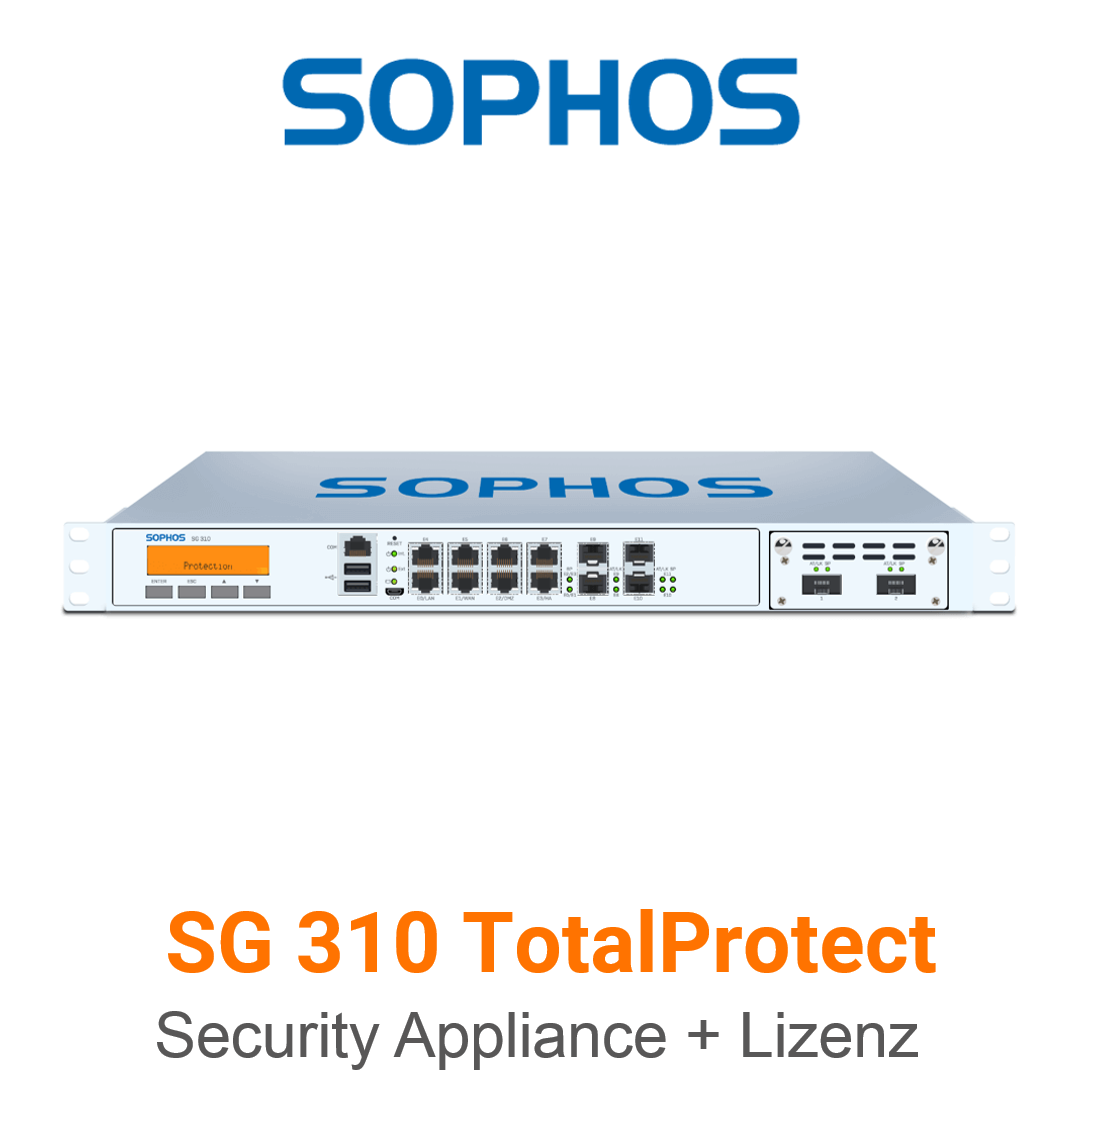 Sophos SG 310 TotalProtect Bundle (Hardware + Lizenz)